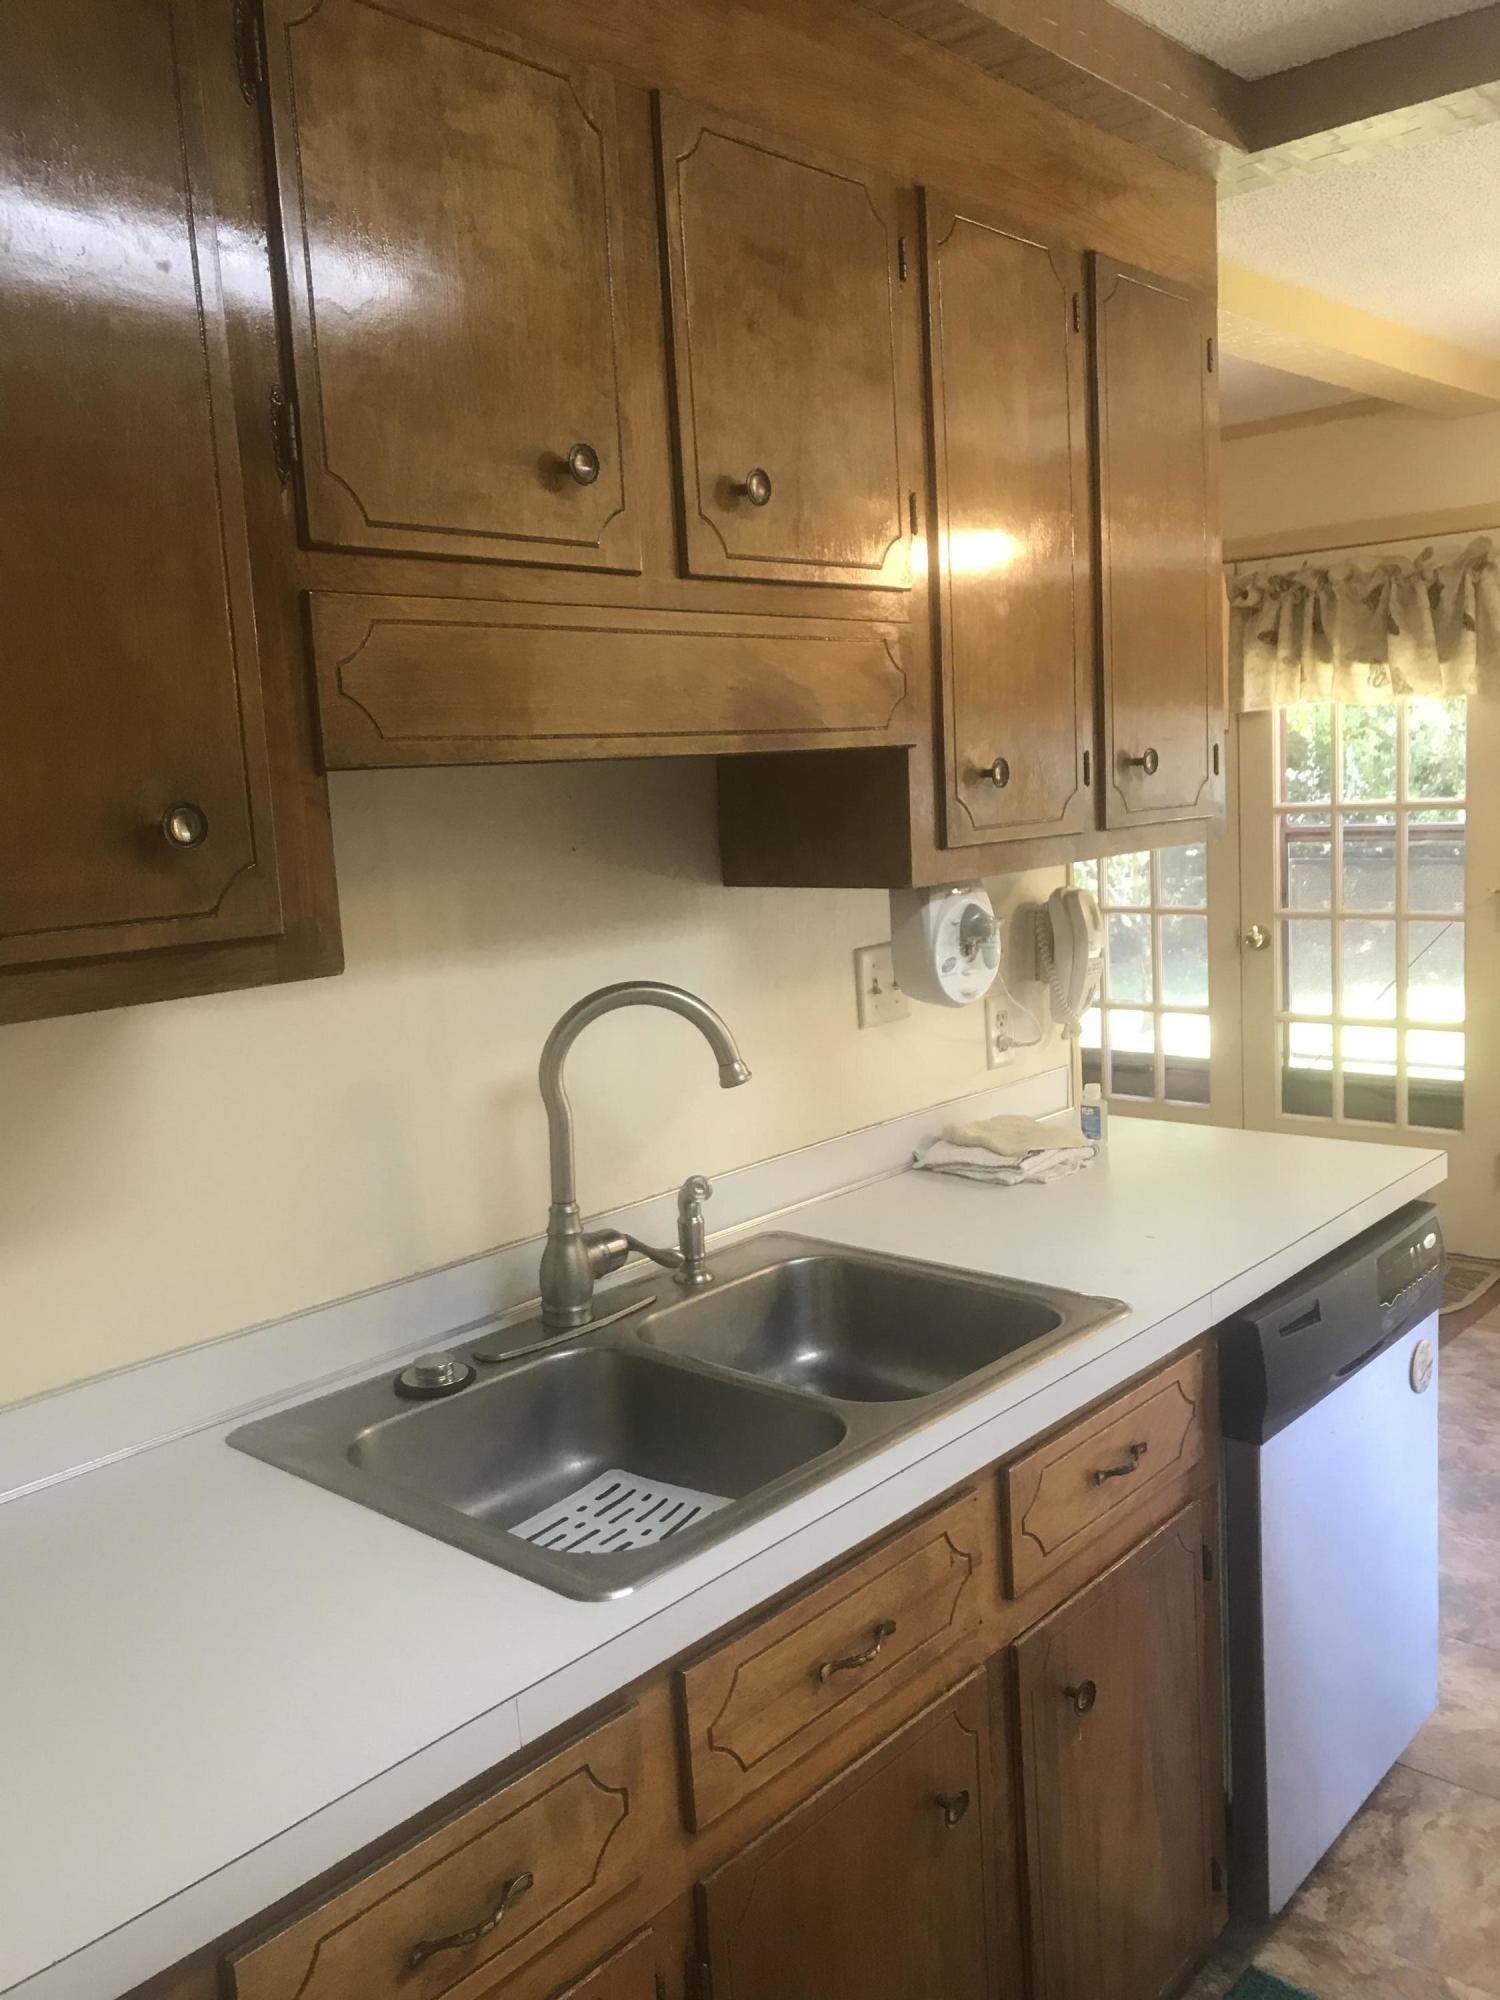 Harborgate Shores Homes For Sale - 1413 Harborgate, Mount Pleasant, SC - 16